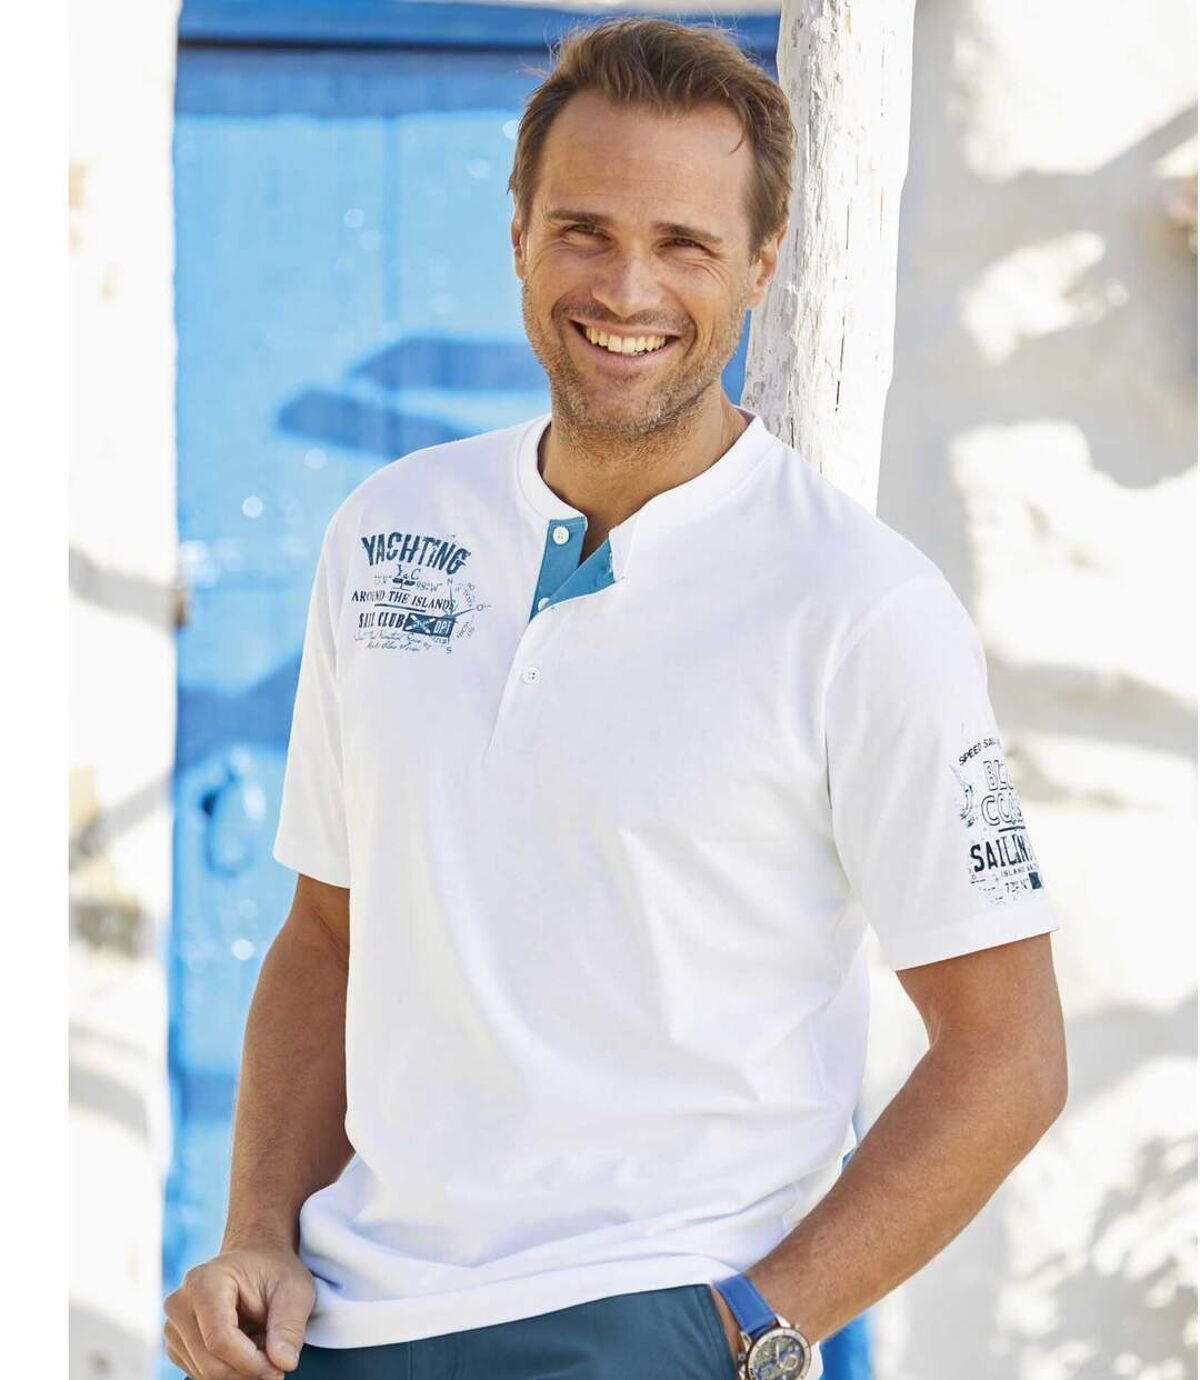 2er-Pack T-Shirts Yachting mit Henleykragen Atlas For Men